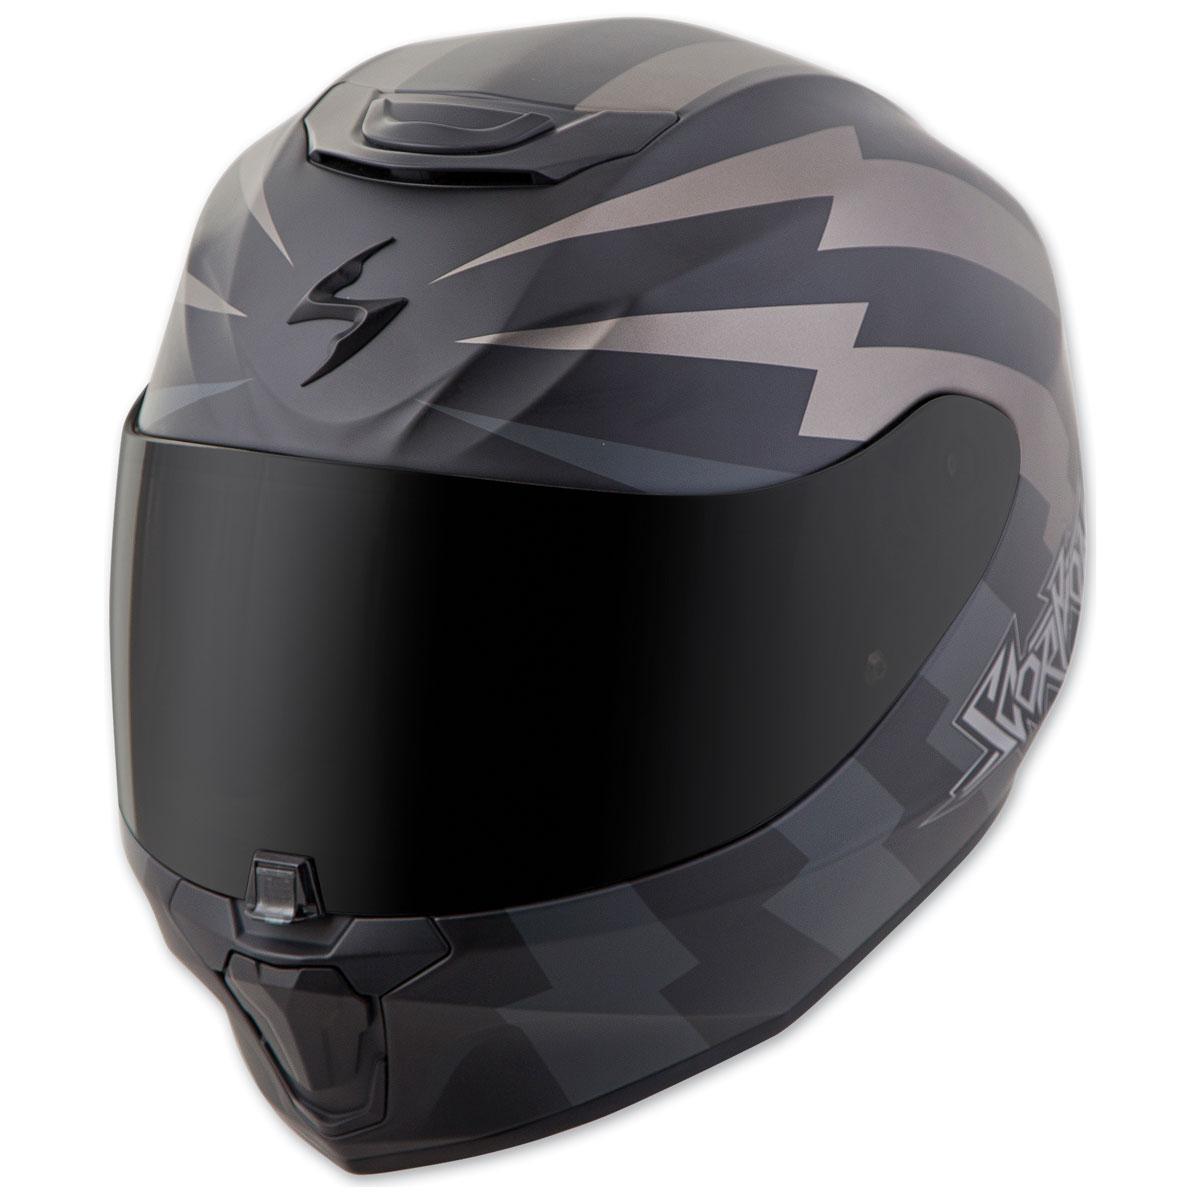 Scorpion EXO EXO-R420 Tracker Titanium/Black Full Face Helmet